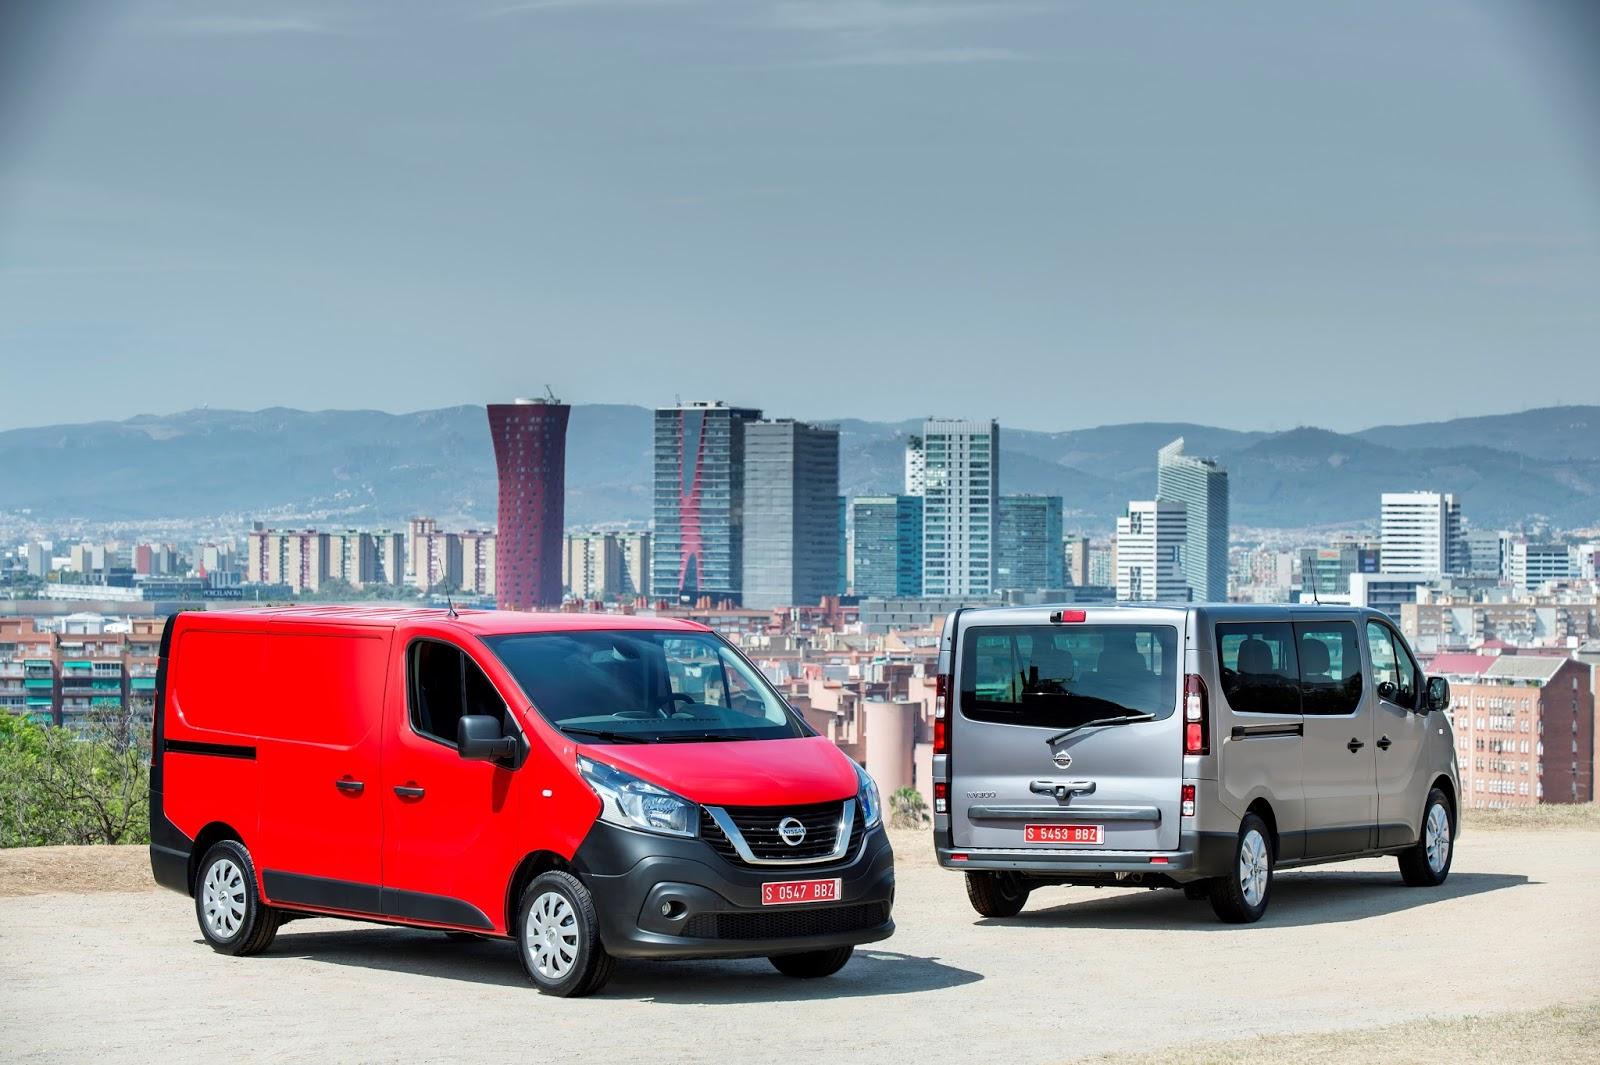 426150063 Nissan NV300 Van and Combi Παγκόσμιο ντεμπούτο για το νέο Nissan NV300 Nissan, Nissan NV, Nissan NV300, Nissan NV400, VAN, videos, Επαγγελματικά